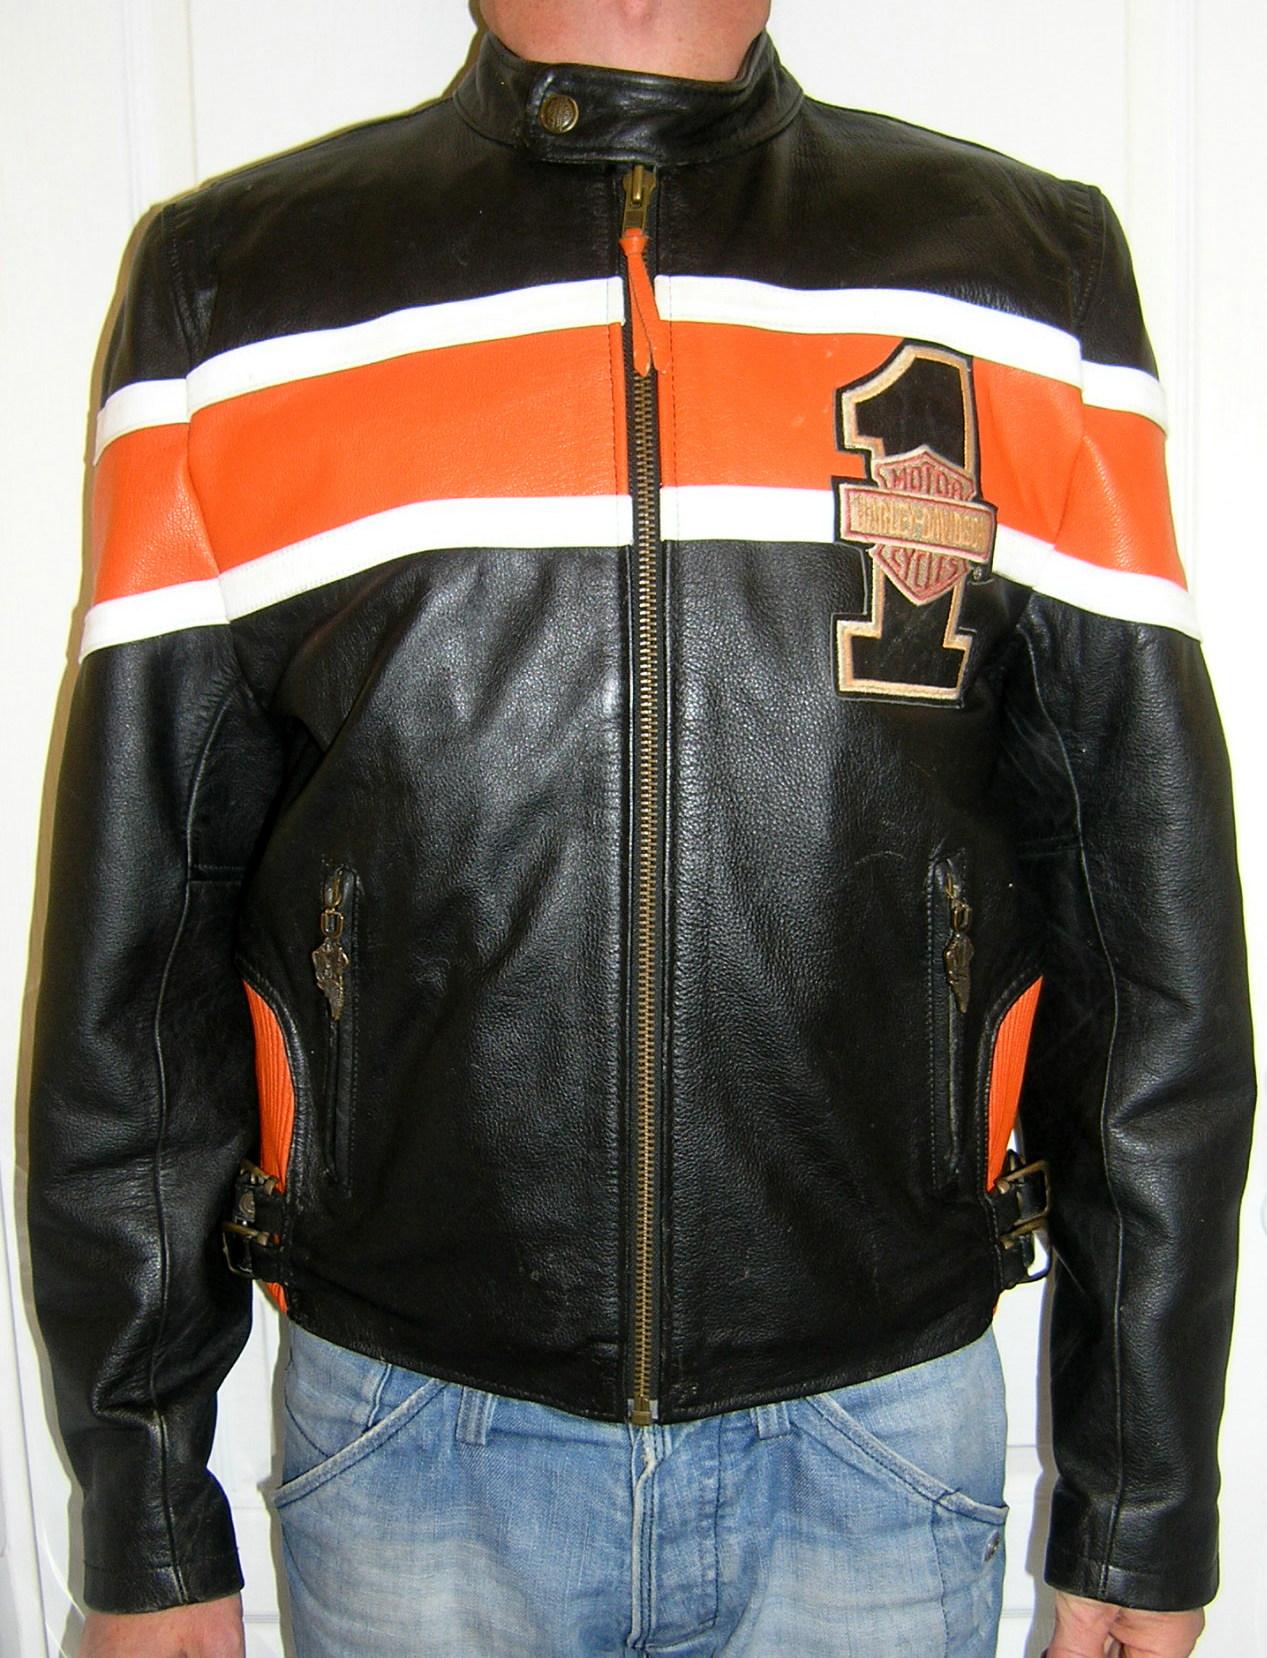 d7264622f4b14 Lux 7395388993 1 Kurtka Racing Lane Victory Harley Davidson RwxnYCvq